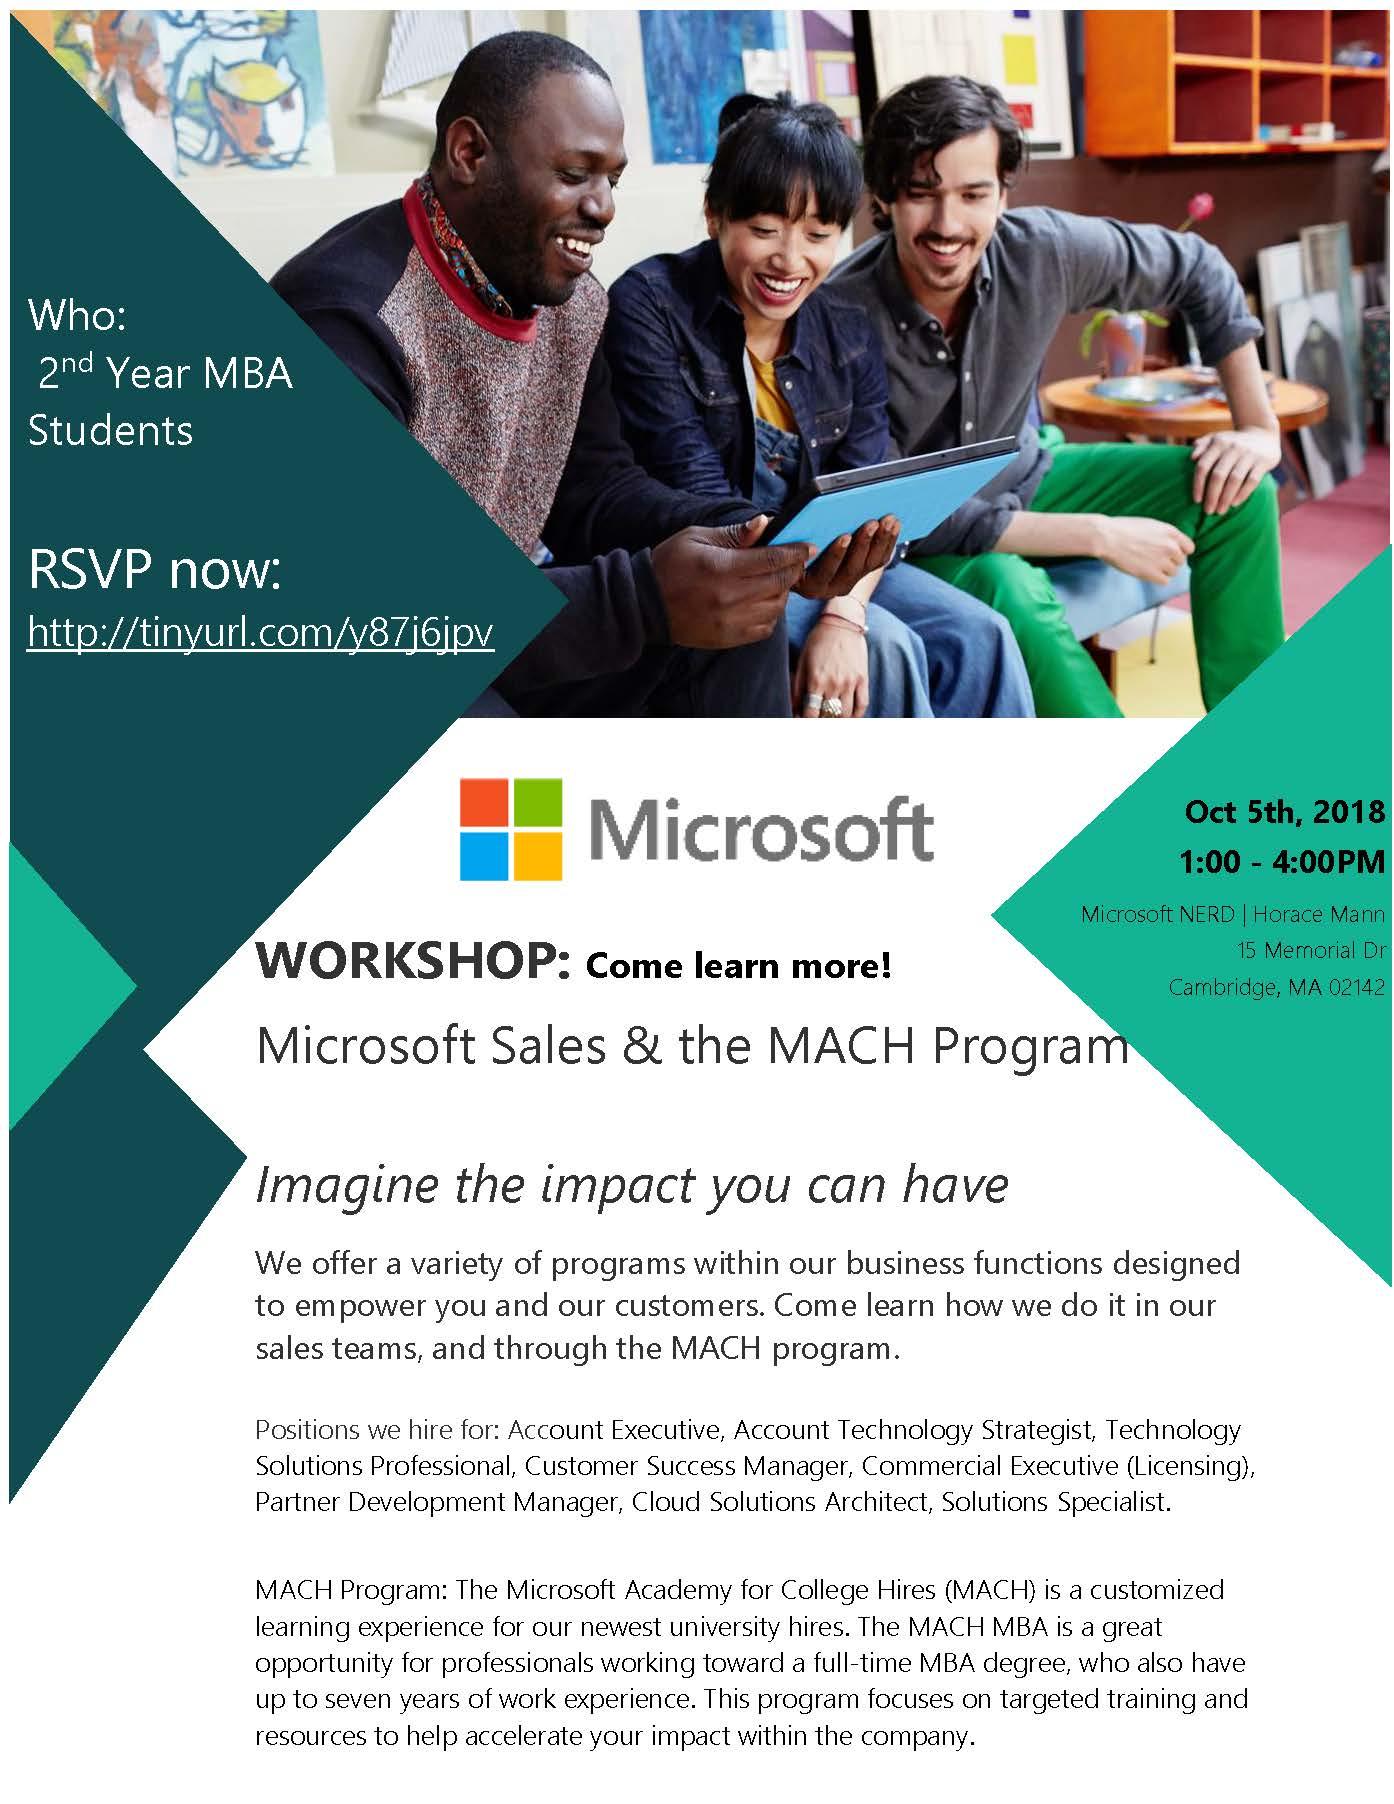 microsoft sales and mach program workshop feld center questrom